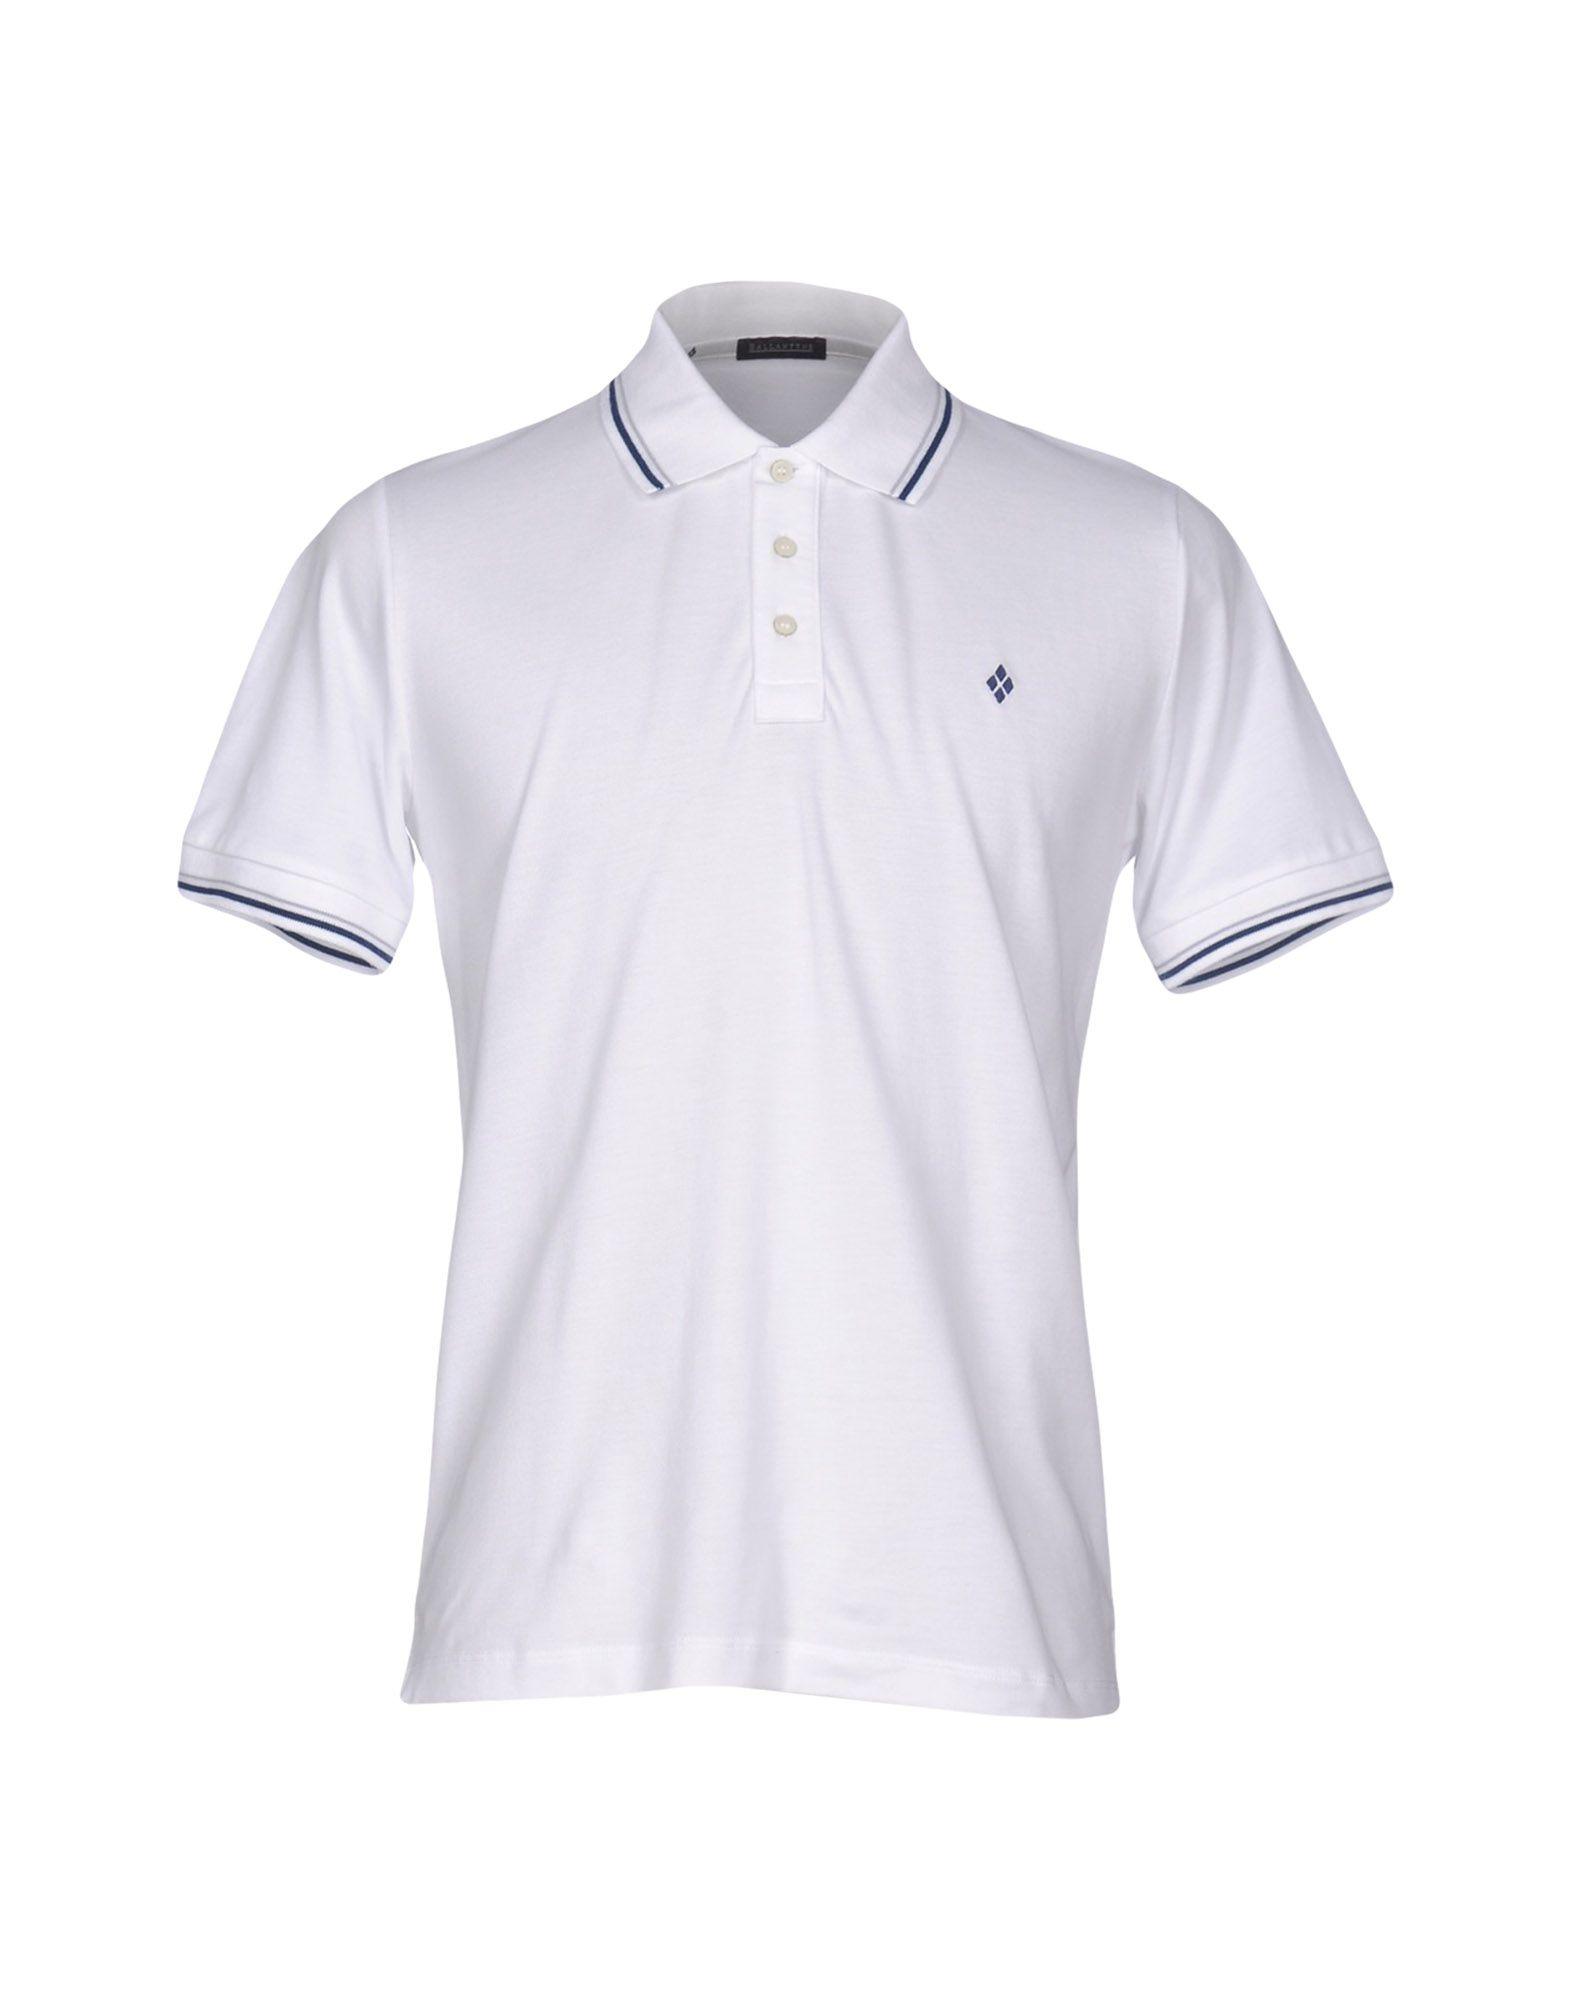 High Quality Men Polo Shirt Printing Bulk Blank T-shirts - Buy Mens Polo T Shirts. Cotton T Shirt. Sialkot Pakistan T Shirt. Plain T Shirt. Tshirt ...